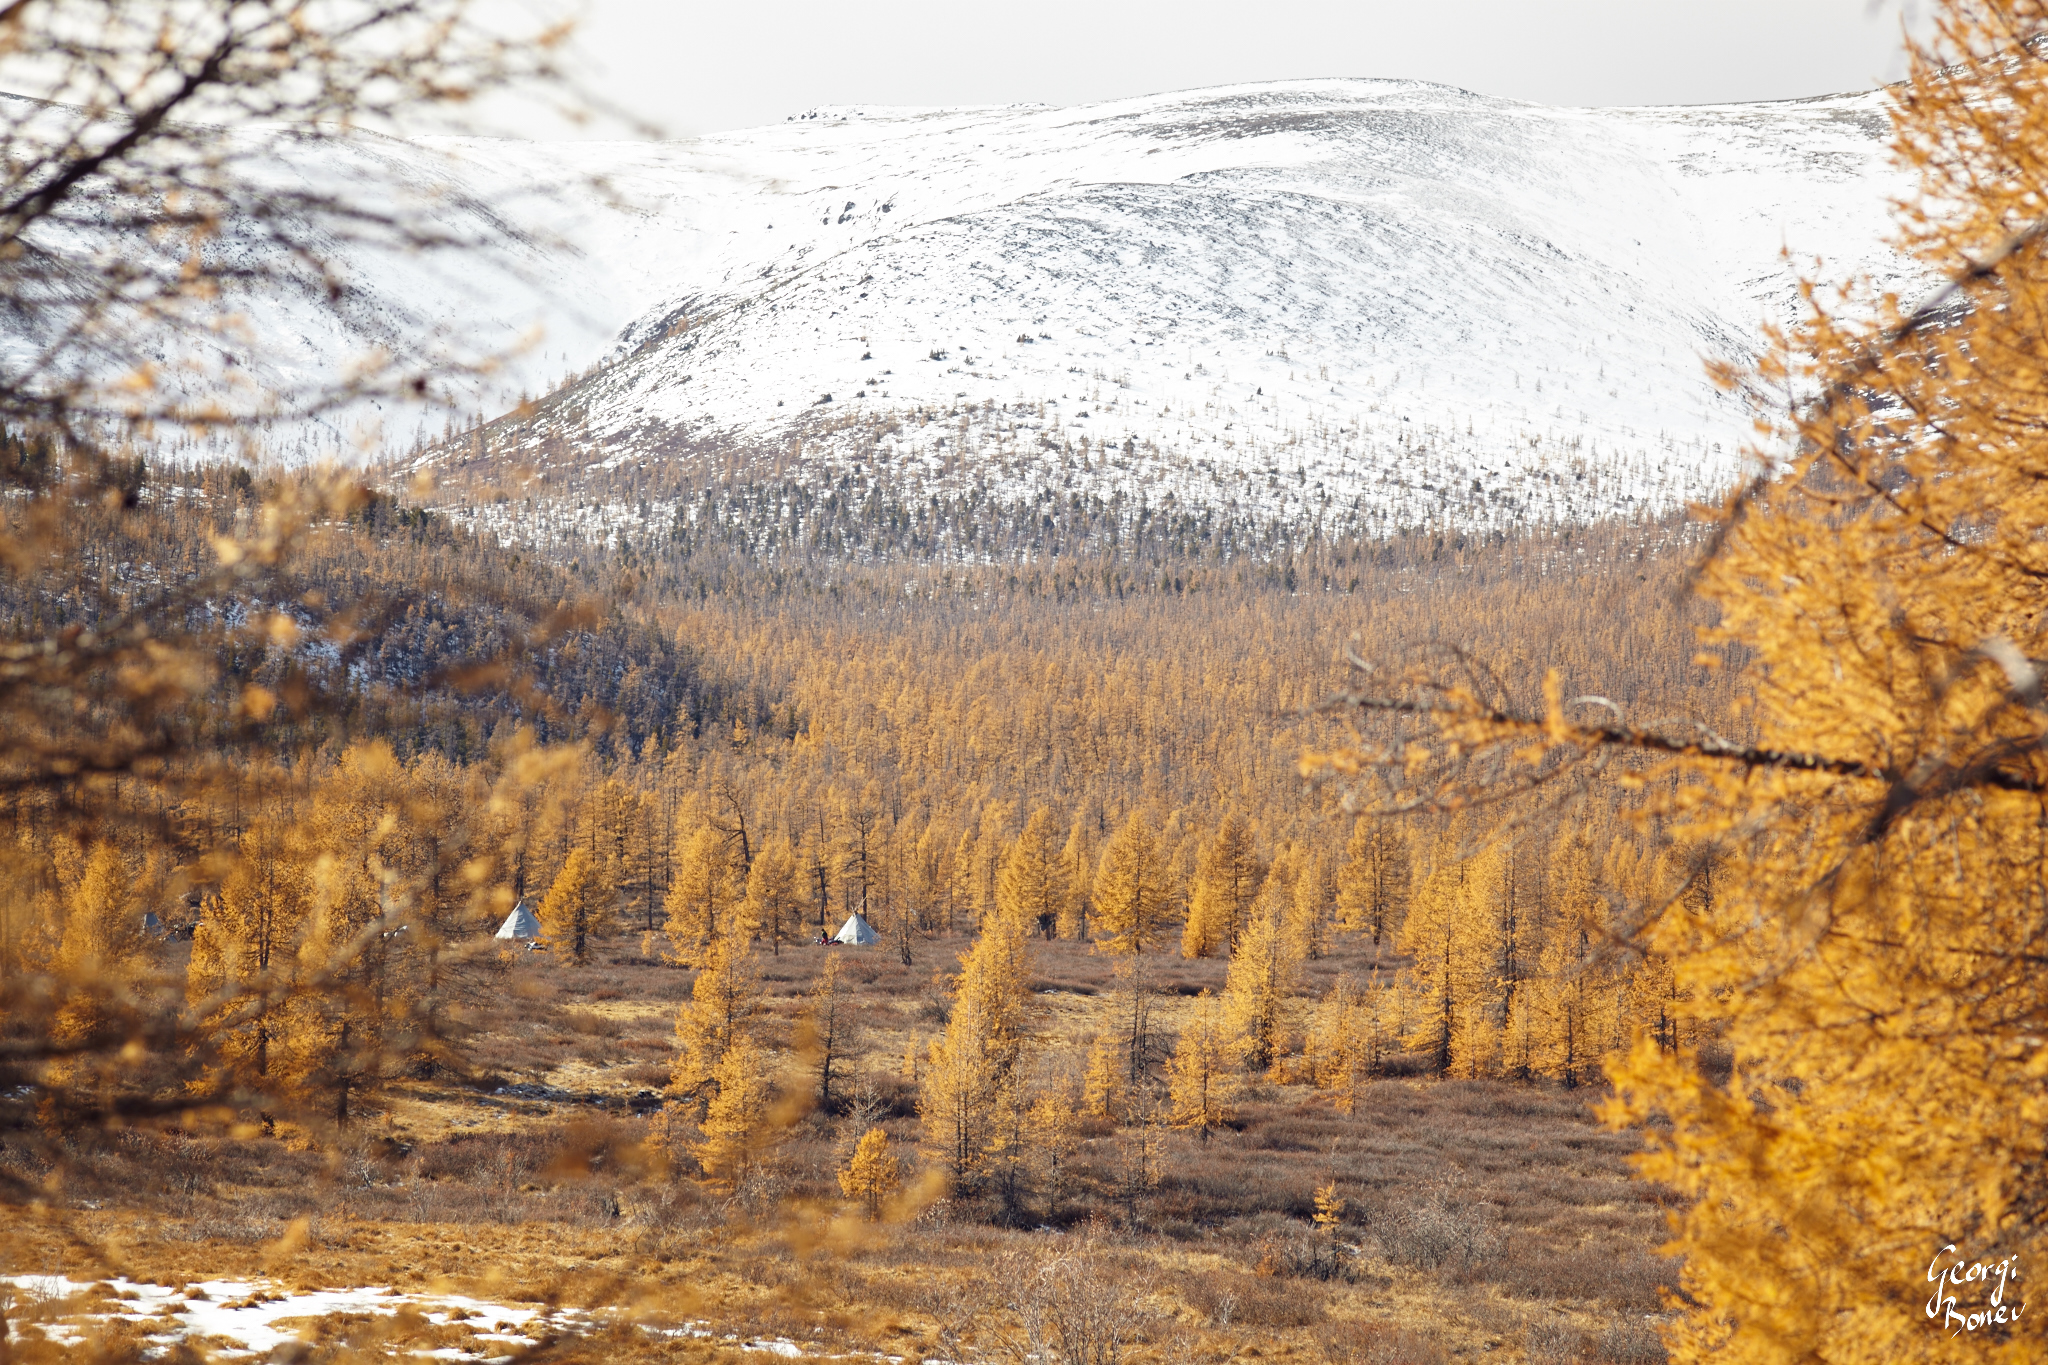 Tsagaannuur Steppe in Mongolia